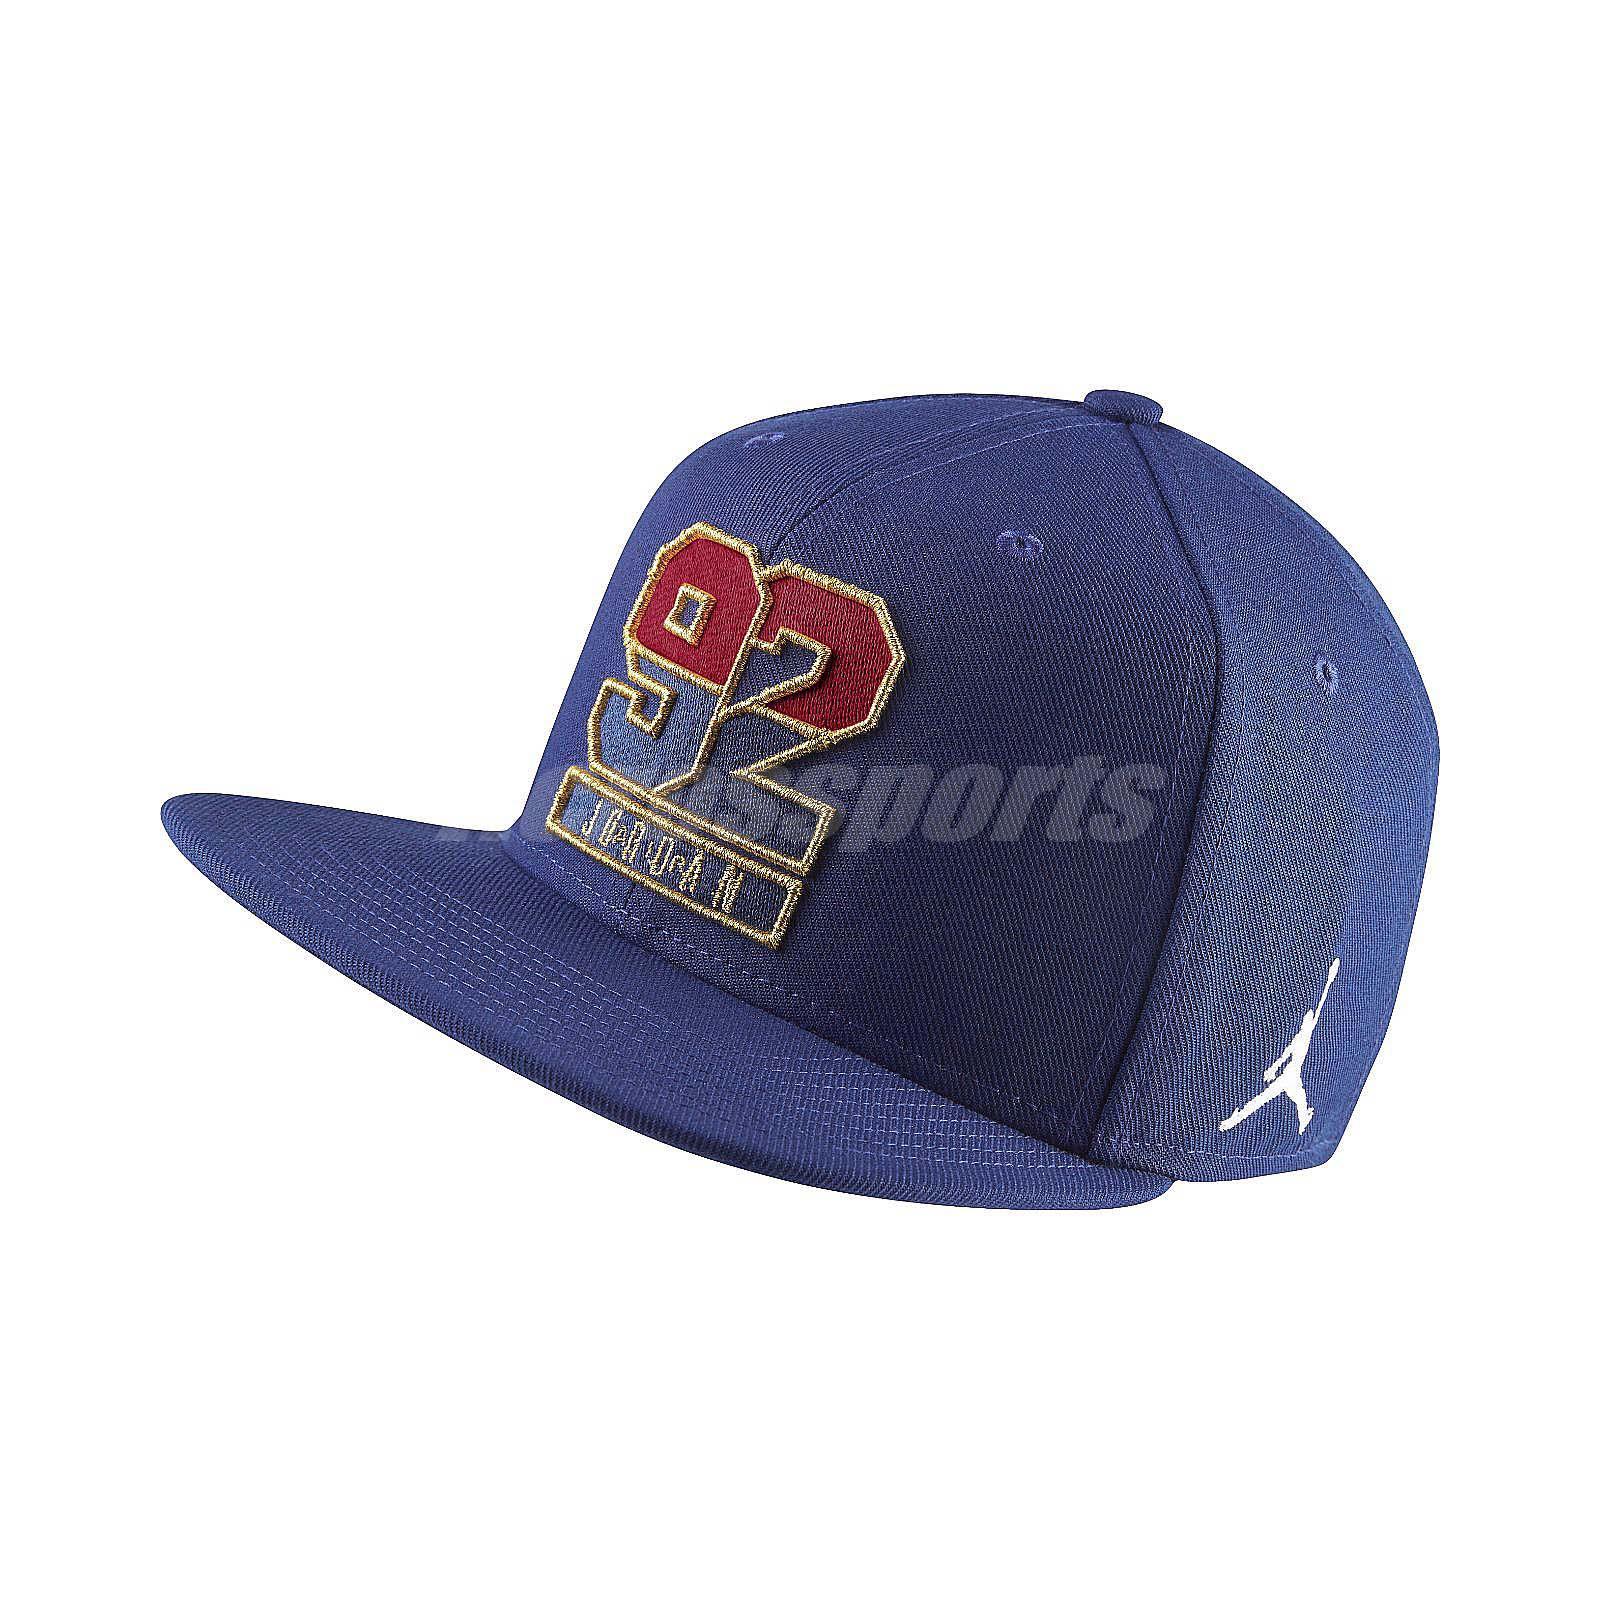 6d0f82e623c Nike Air Jordan AJ 7 1992 USA Dream Team Adjustable Hat Cap Snapback  823526-455